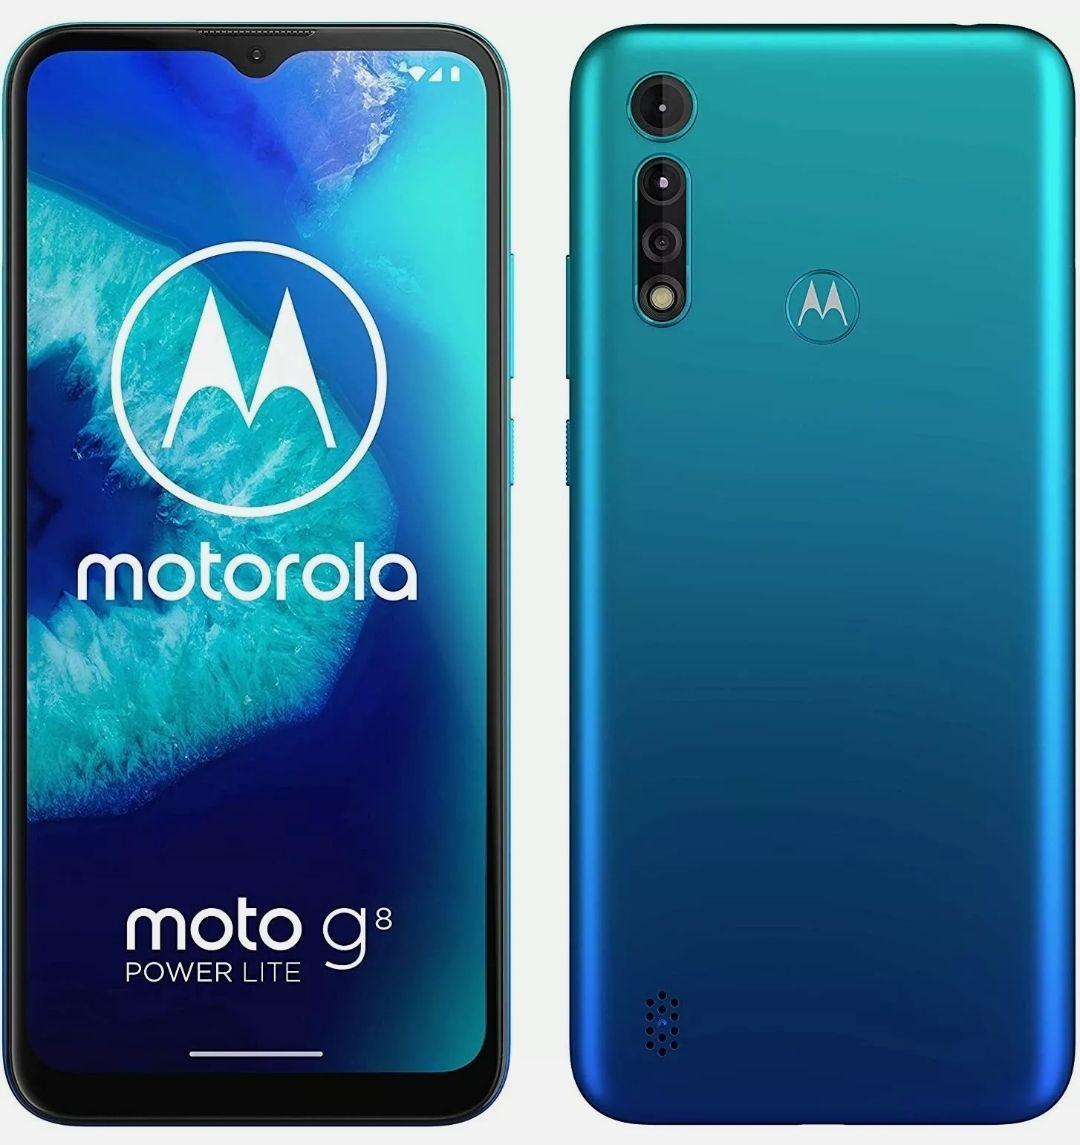 Motorola Moto G8 Power Lite Smartphone 64GB Unlocked *Arctic Blue* B Refurbished Condition - £67.45 With Code @ Cheapest_electrical / eBay